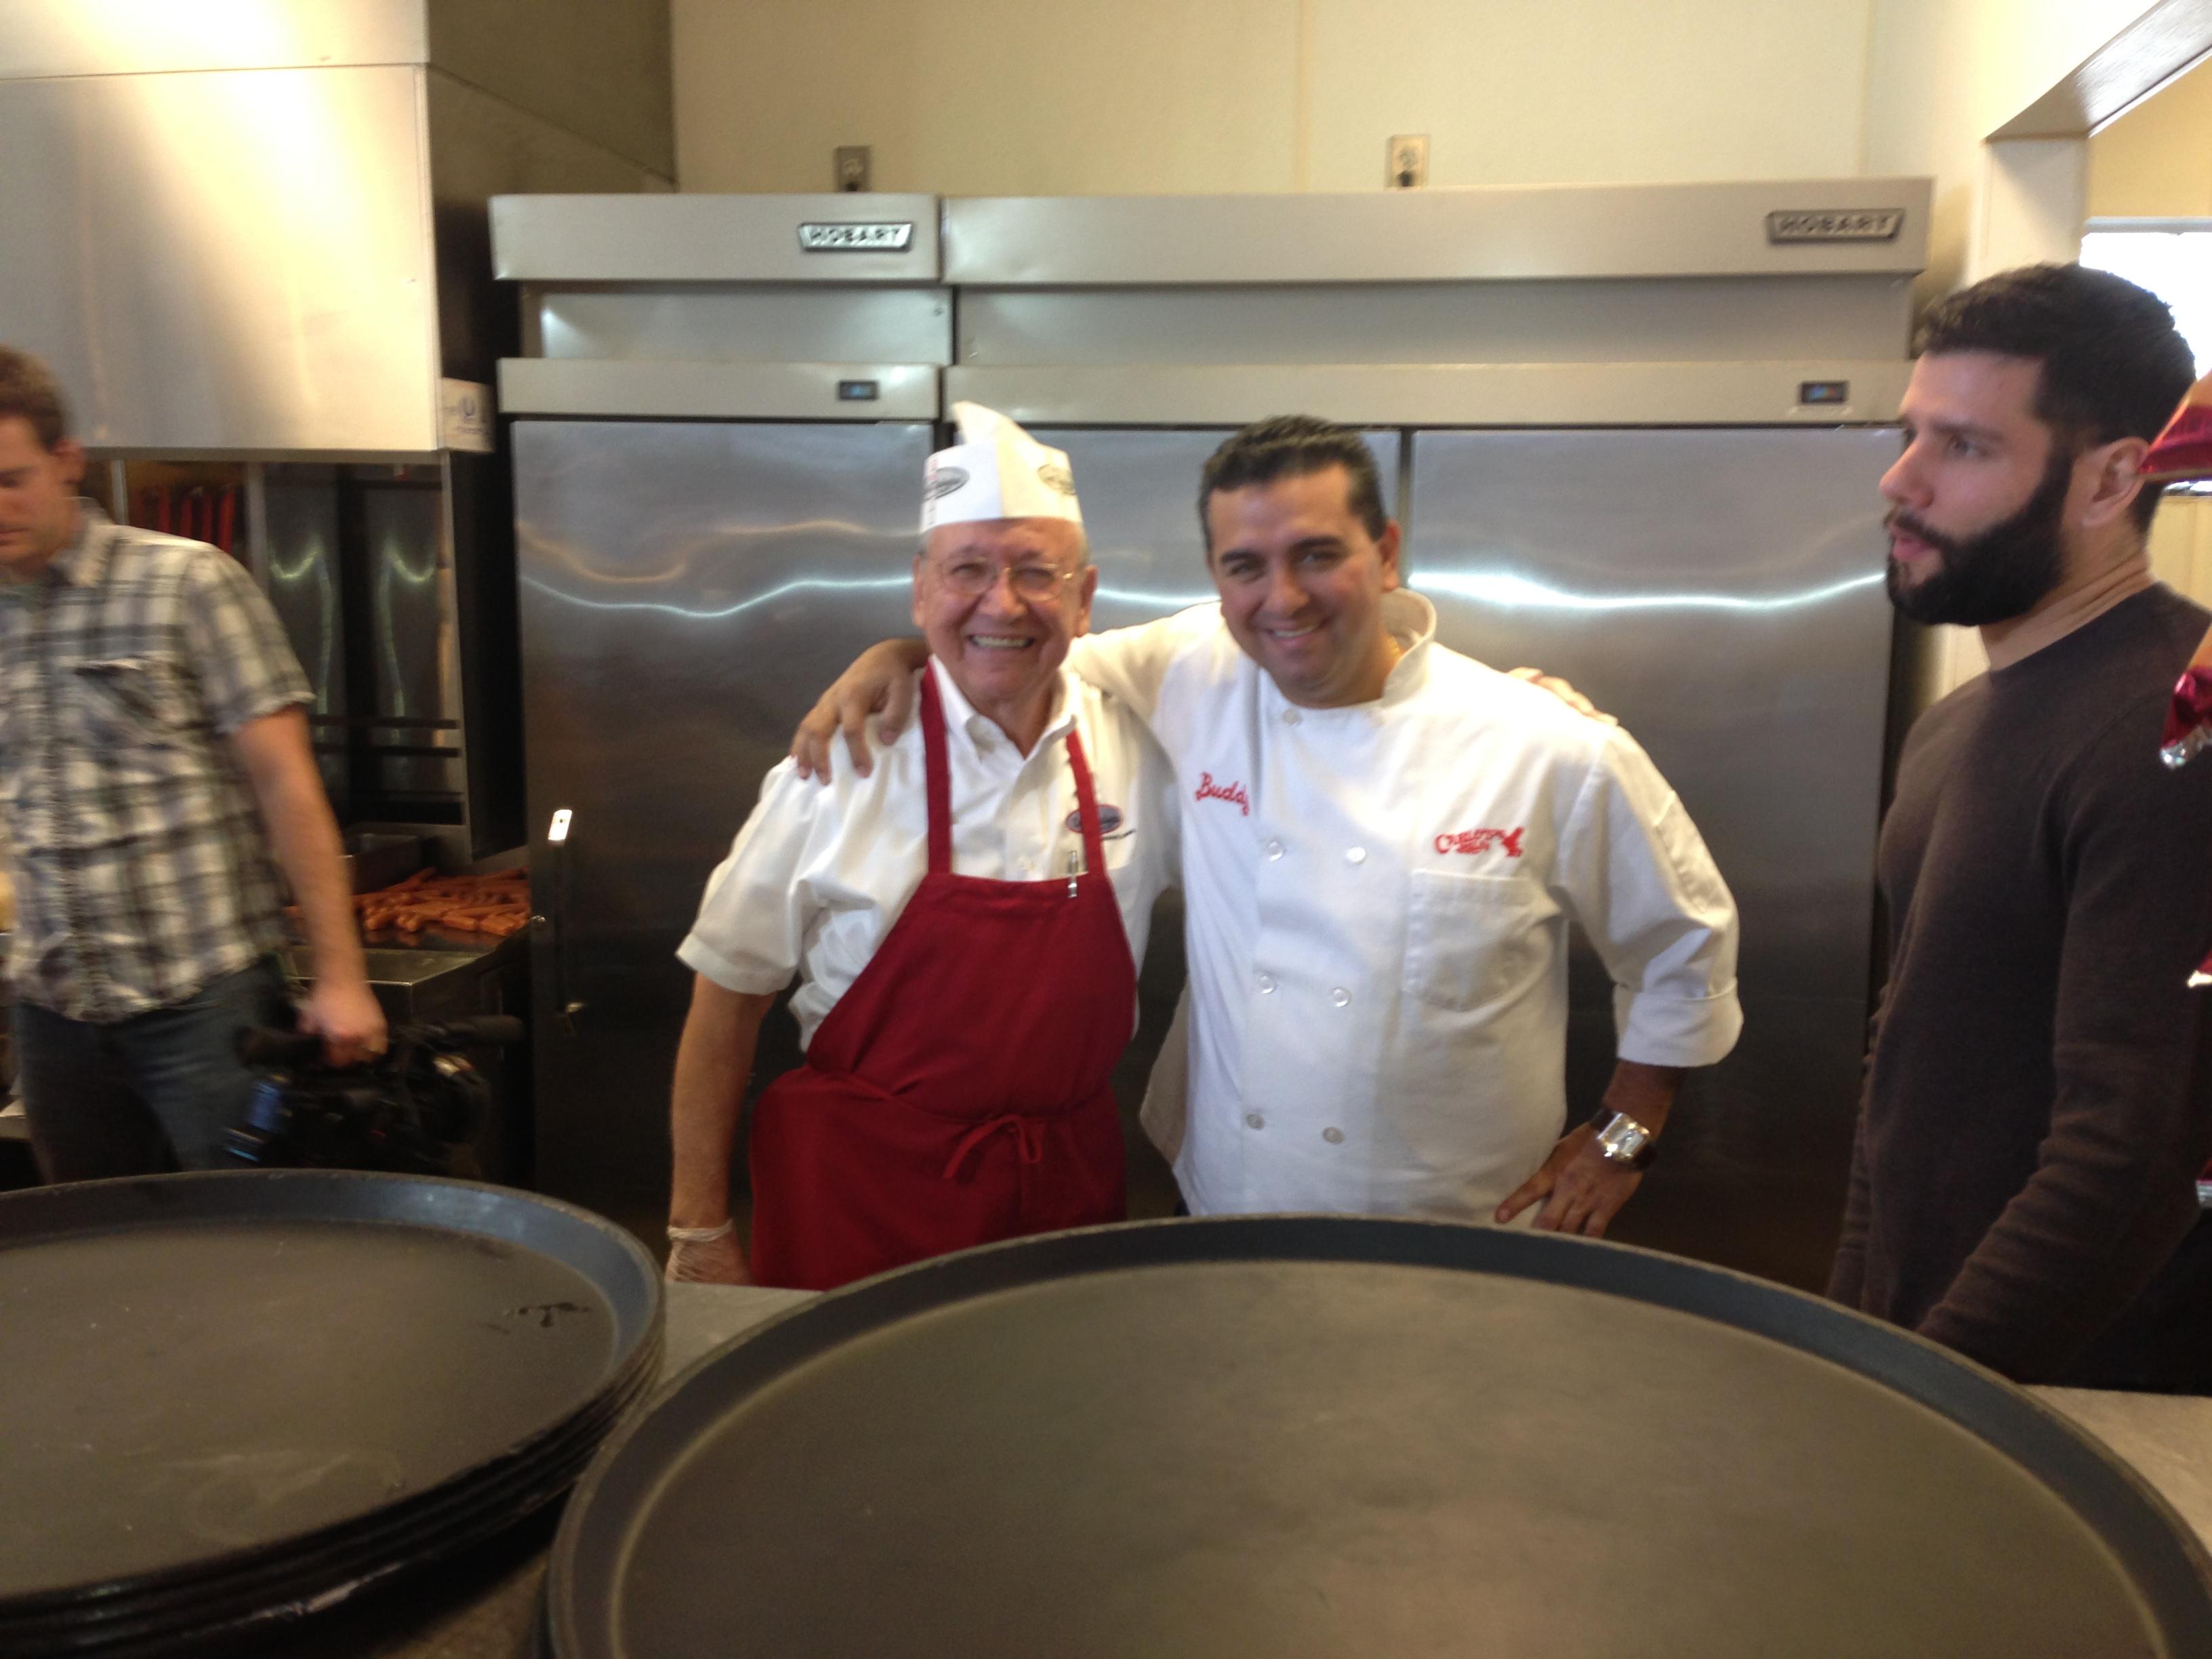 Buddy 'Cake Boss' Valastro visits CWC